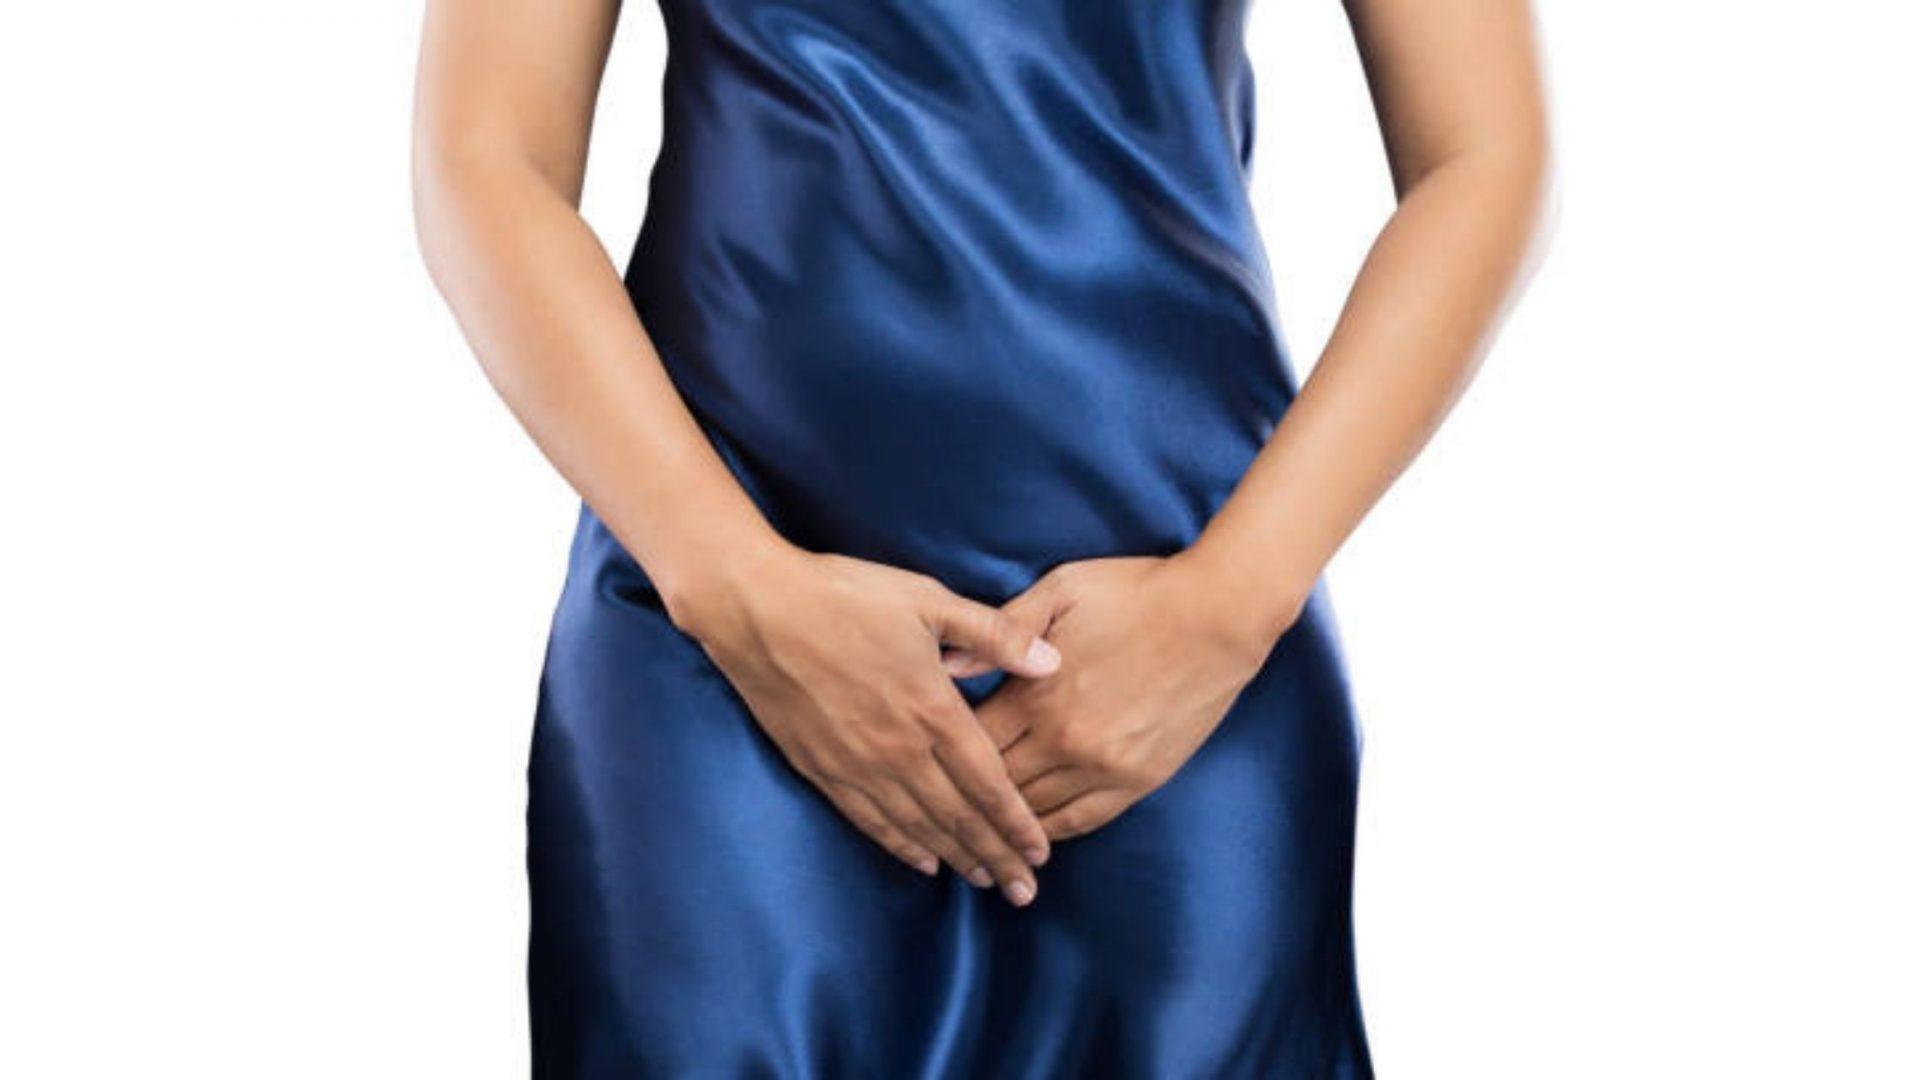 Vaginal Dryness and Lubrication